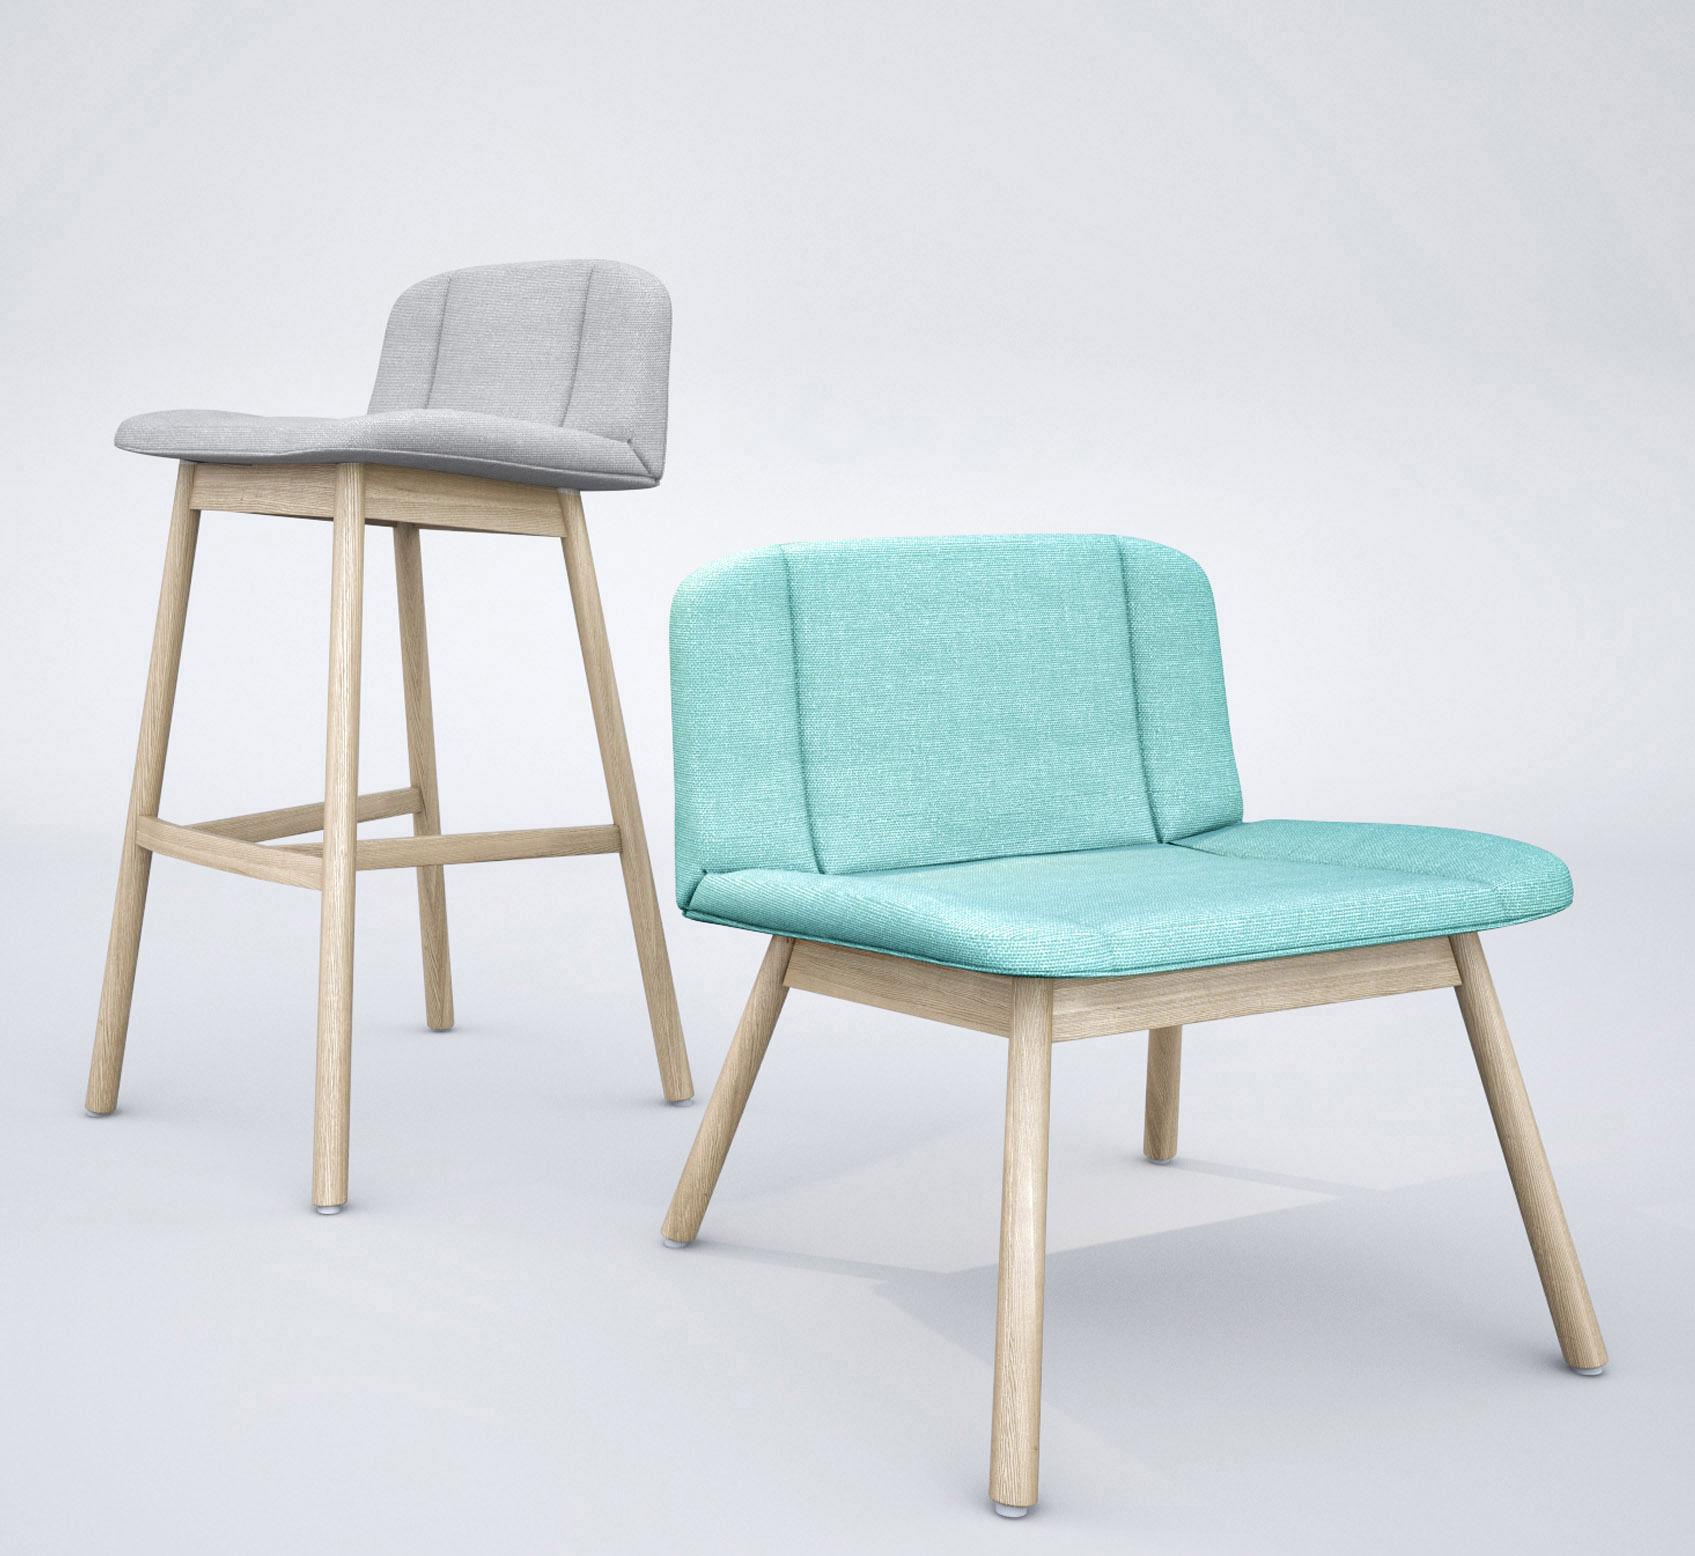 Billiani Hippy Lounge chair and Bar stool